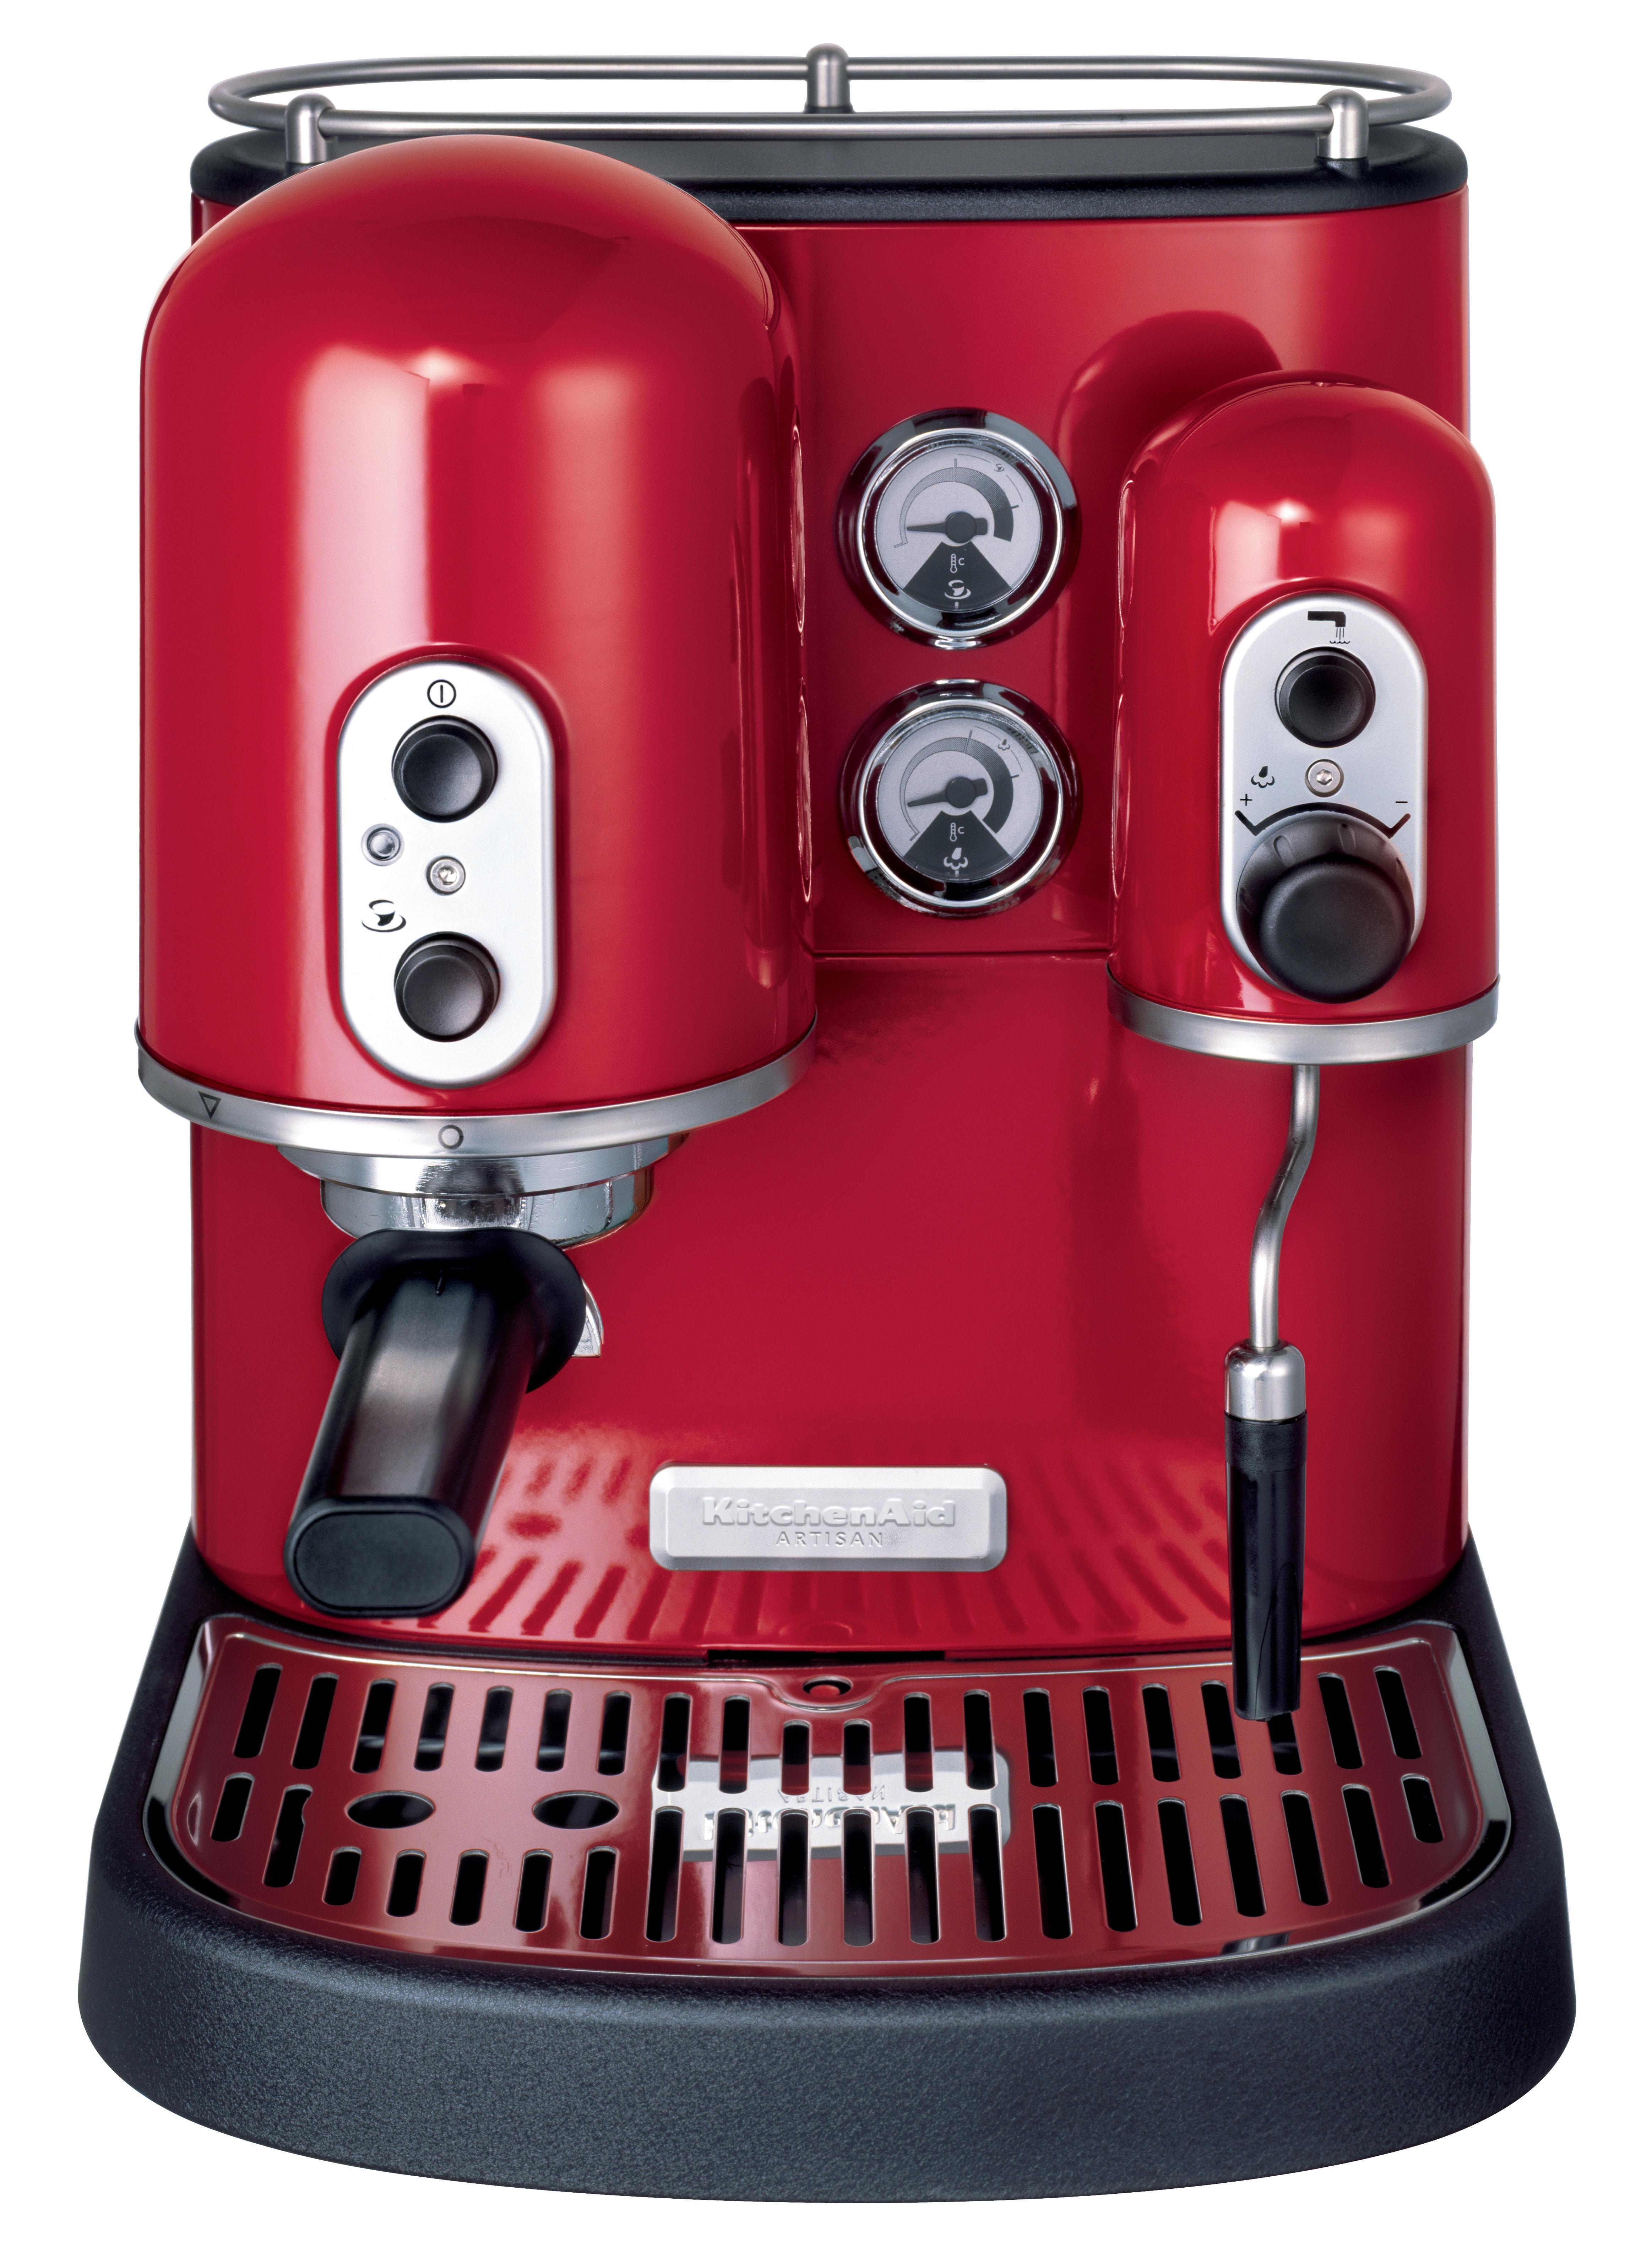 Kitchenware - Kitchen Appliances - Artisan Electric espresso maker by KitchenAid - Red - Cast metal